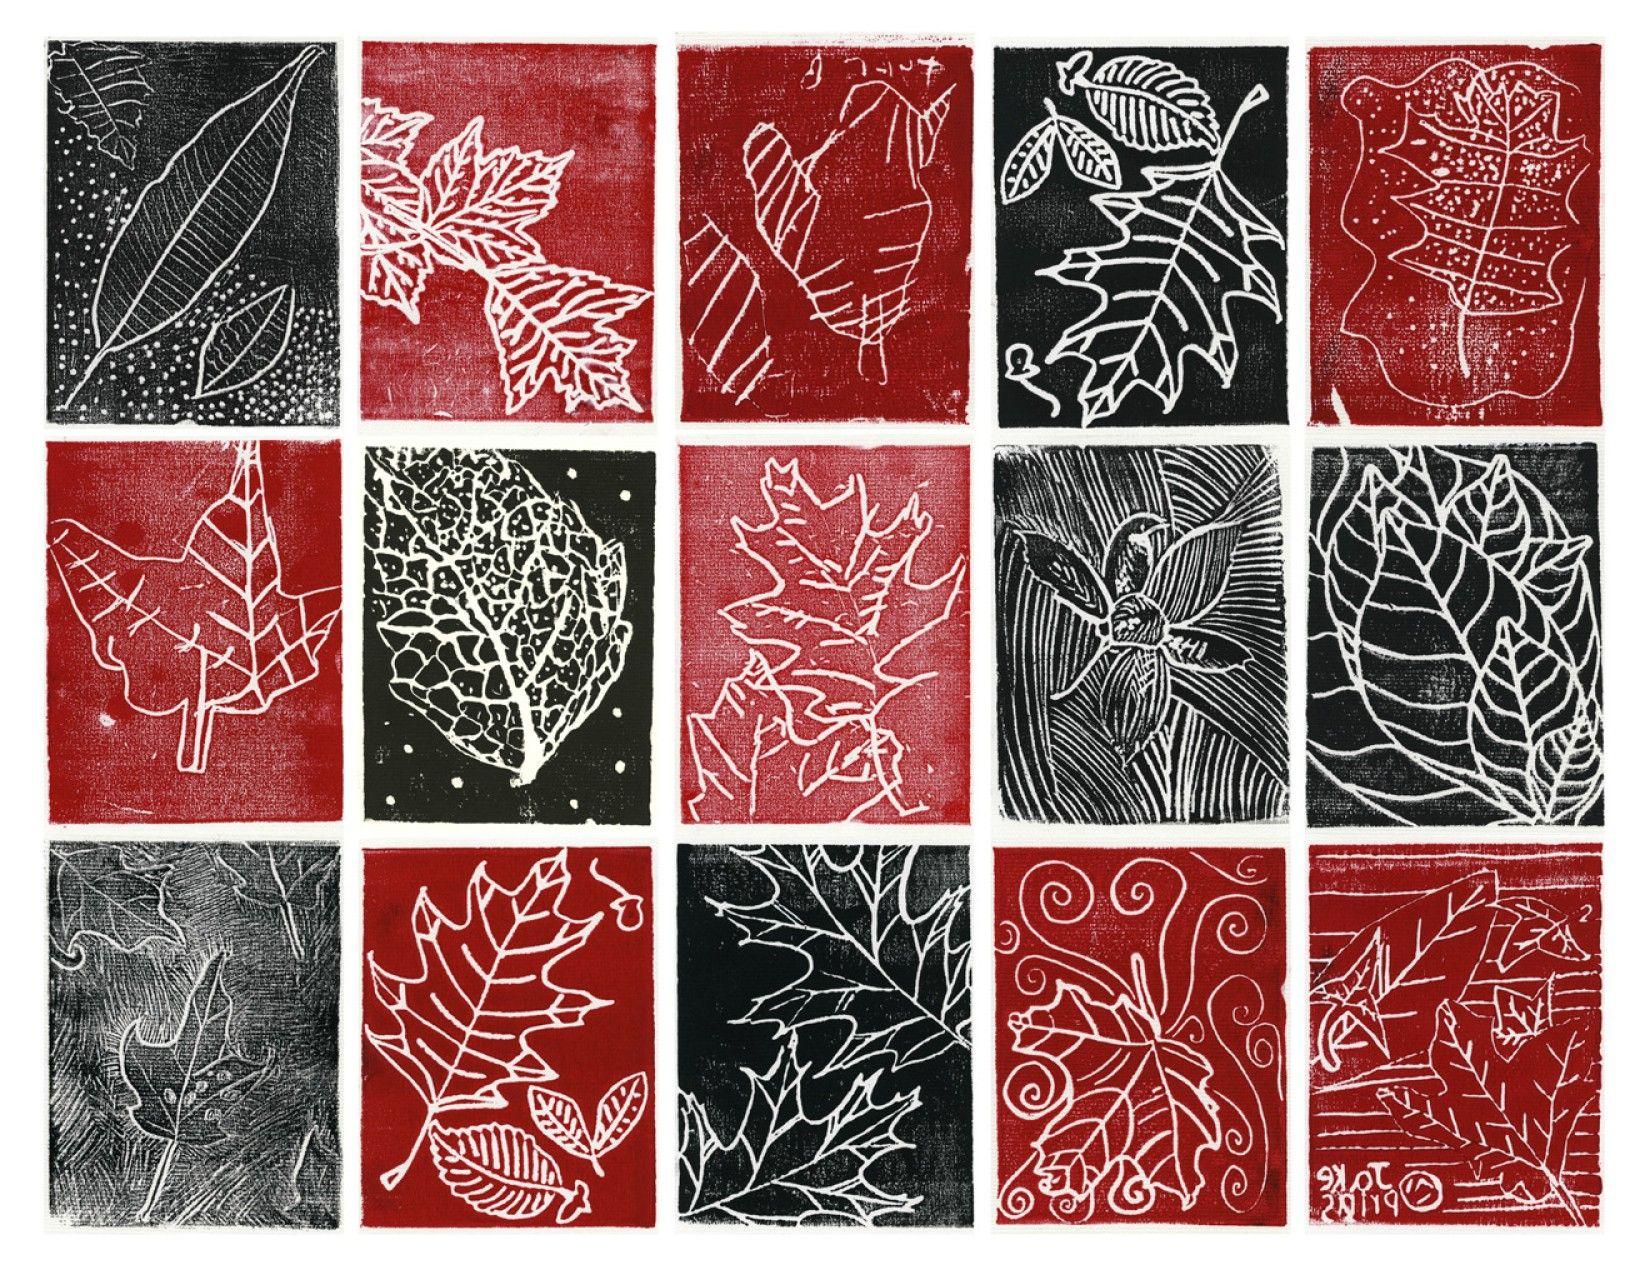 monoprinting leaves   Printmaking   Pinterest   Drucktechnik und Rose